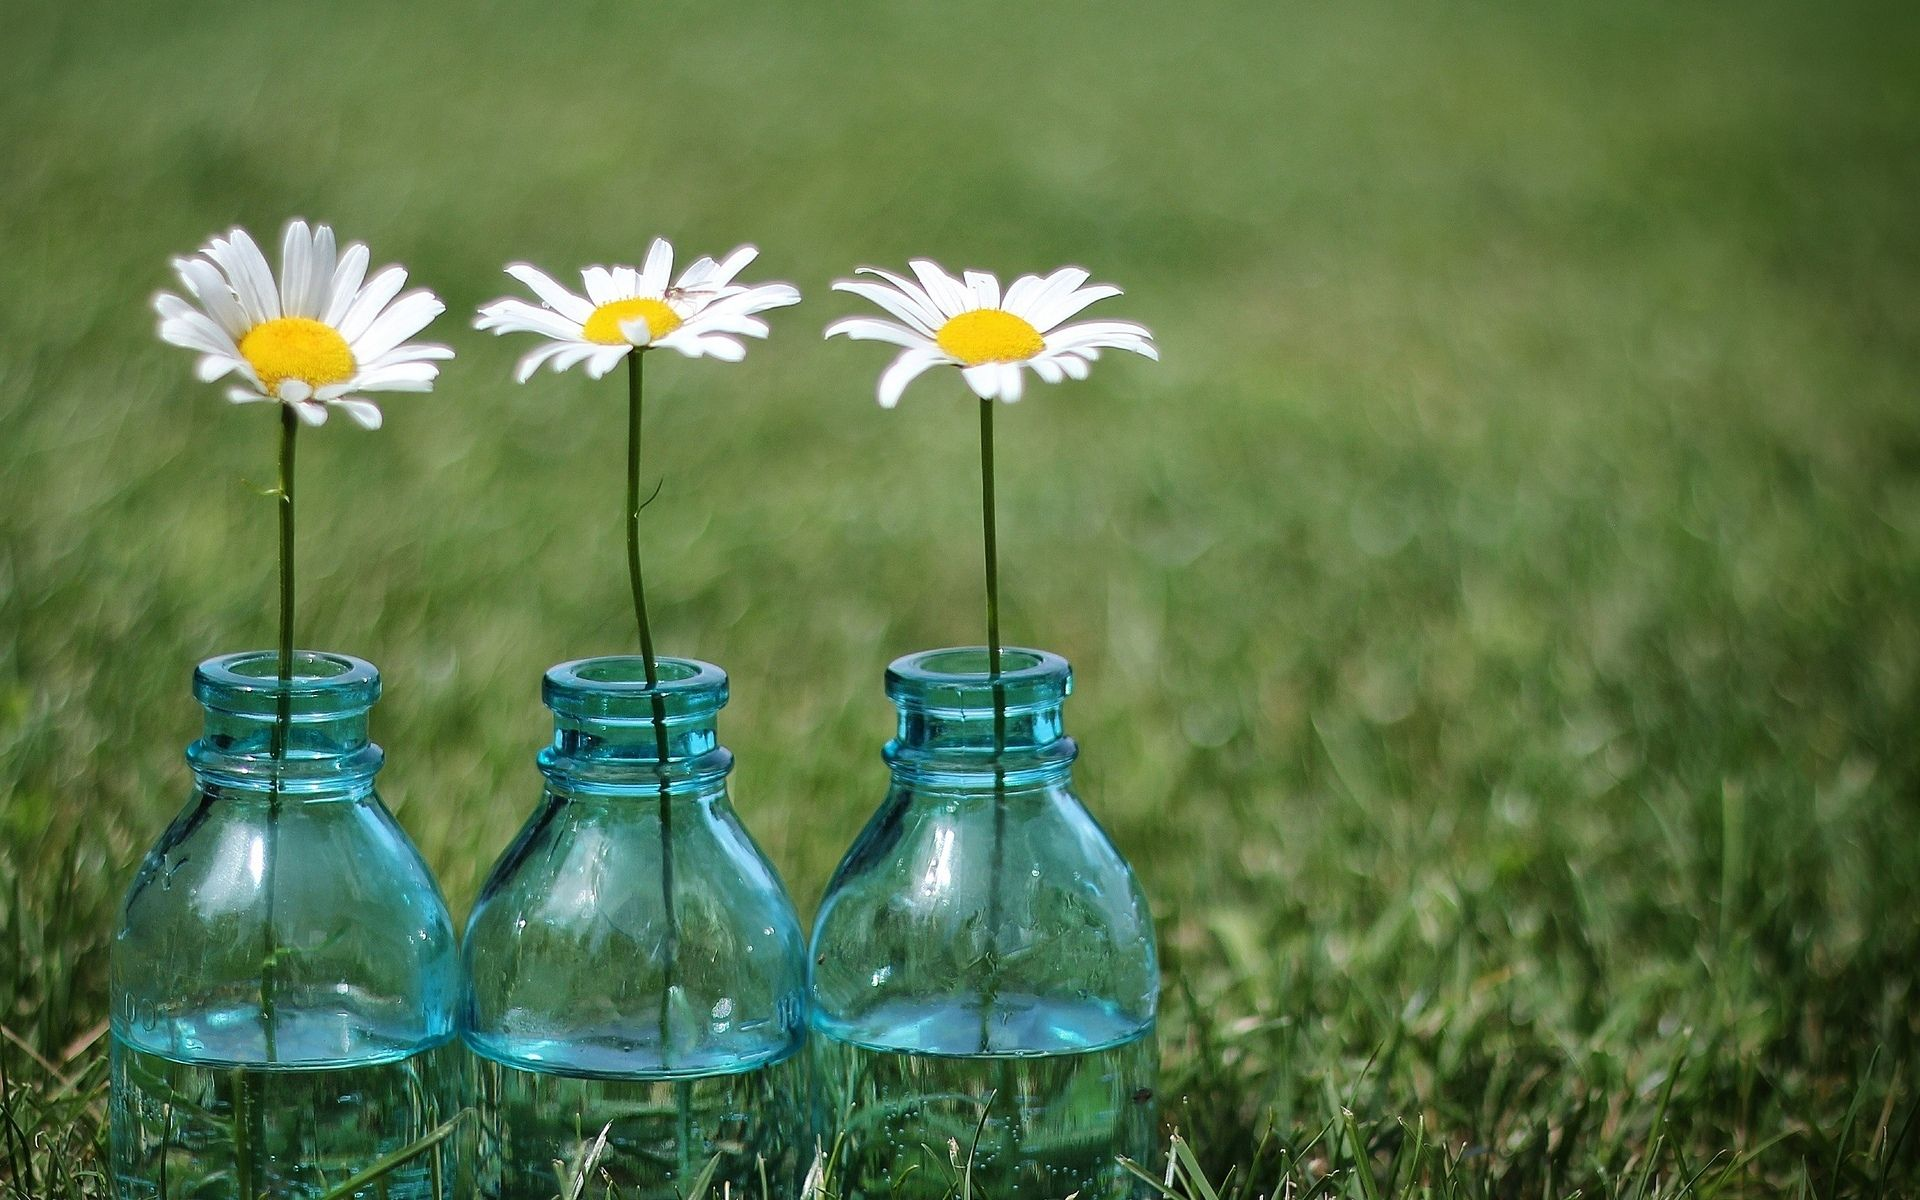 daisy background images